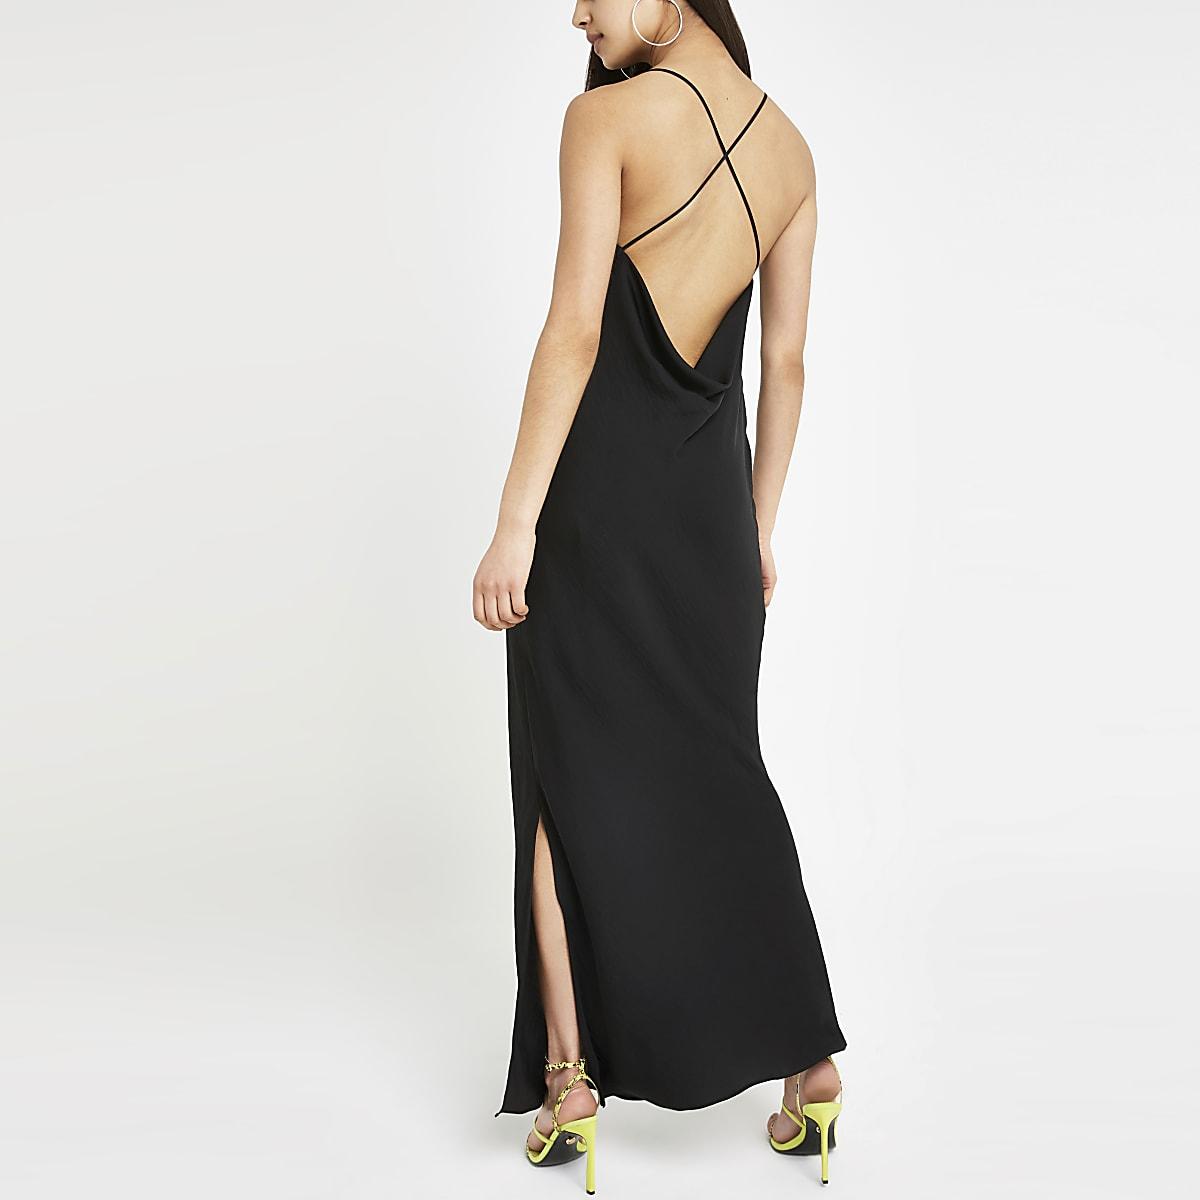 Black slip maxi dress